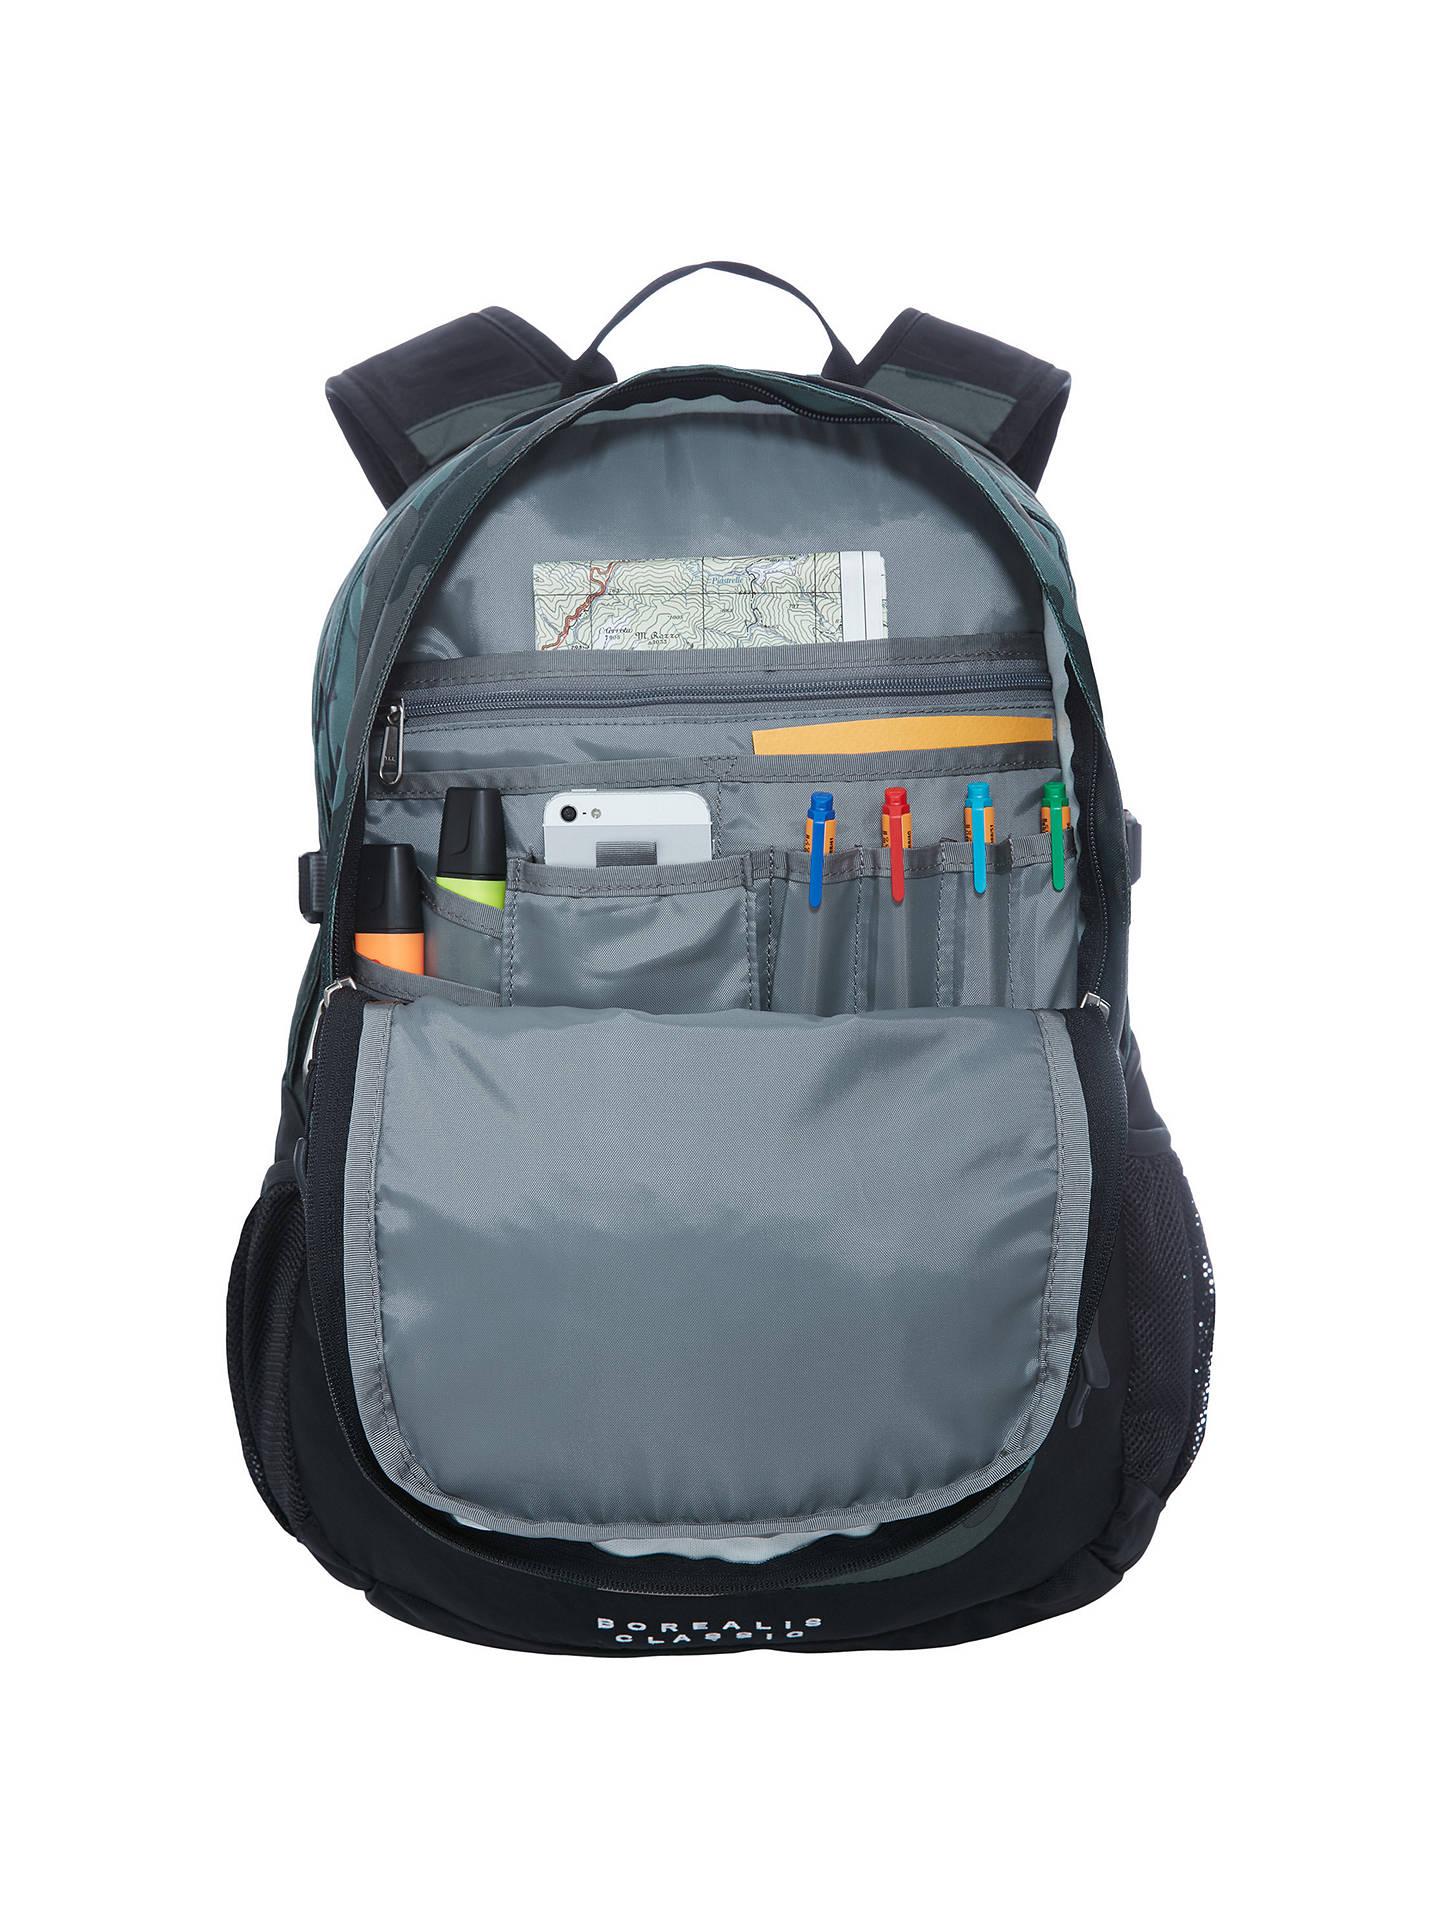 7678a2e0a The North Face Borealis Backpack, Black Camo at John Lewis & Partners